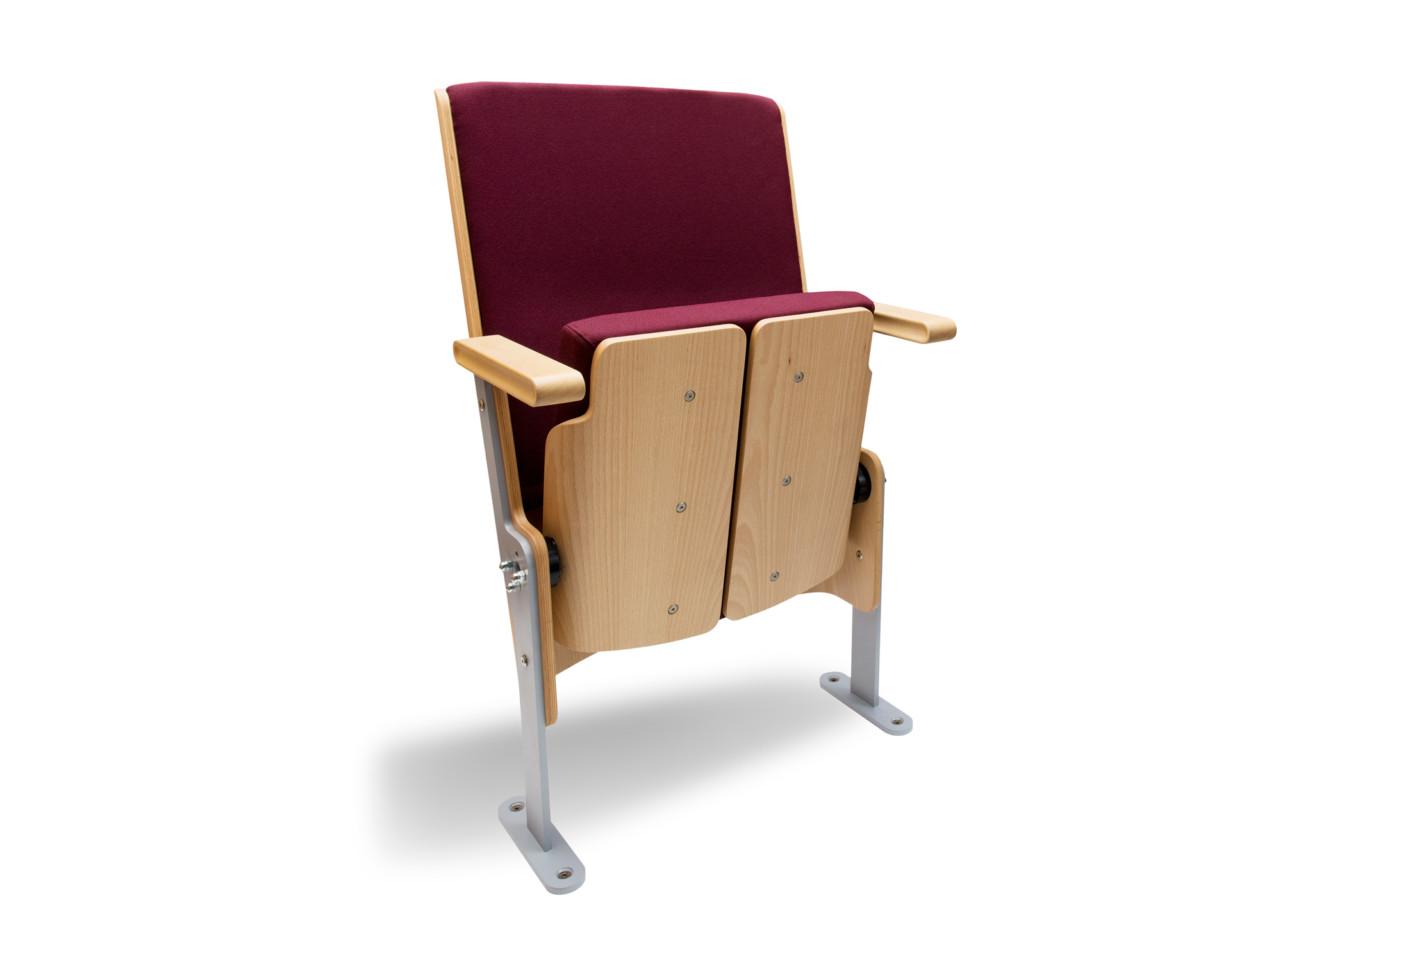 empac chair von poltrona frau stylepark. Black Bedroom Furniture Sets. Home Design Ideas